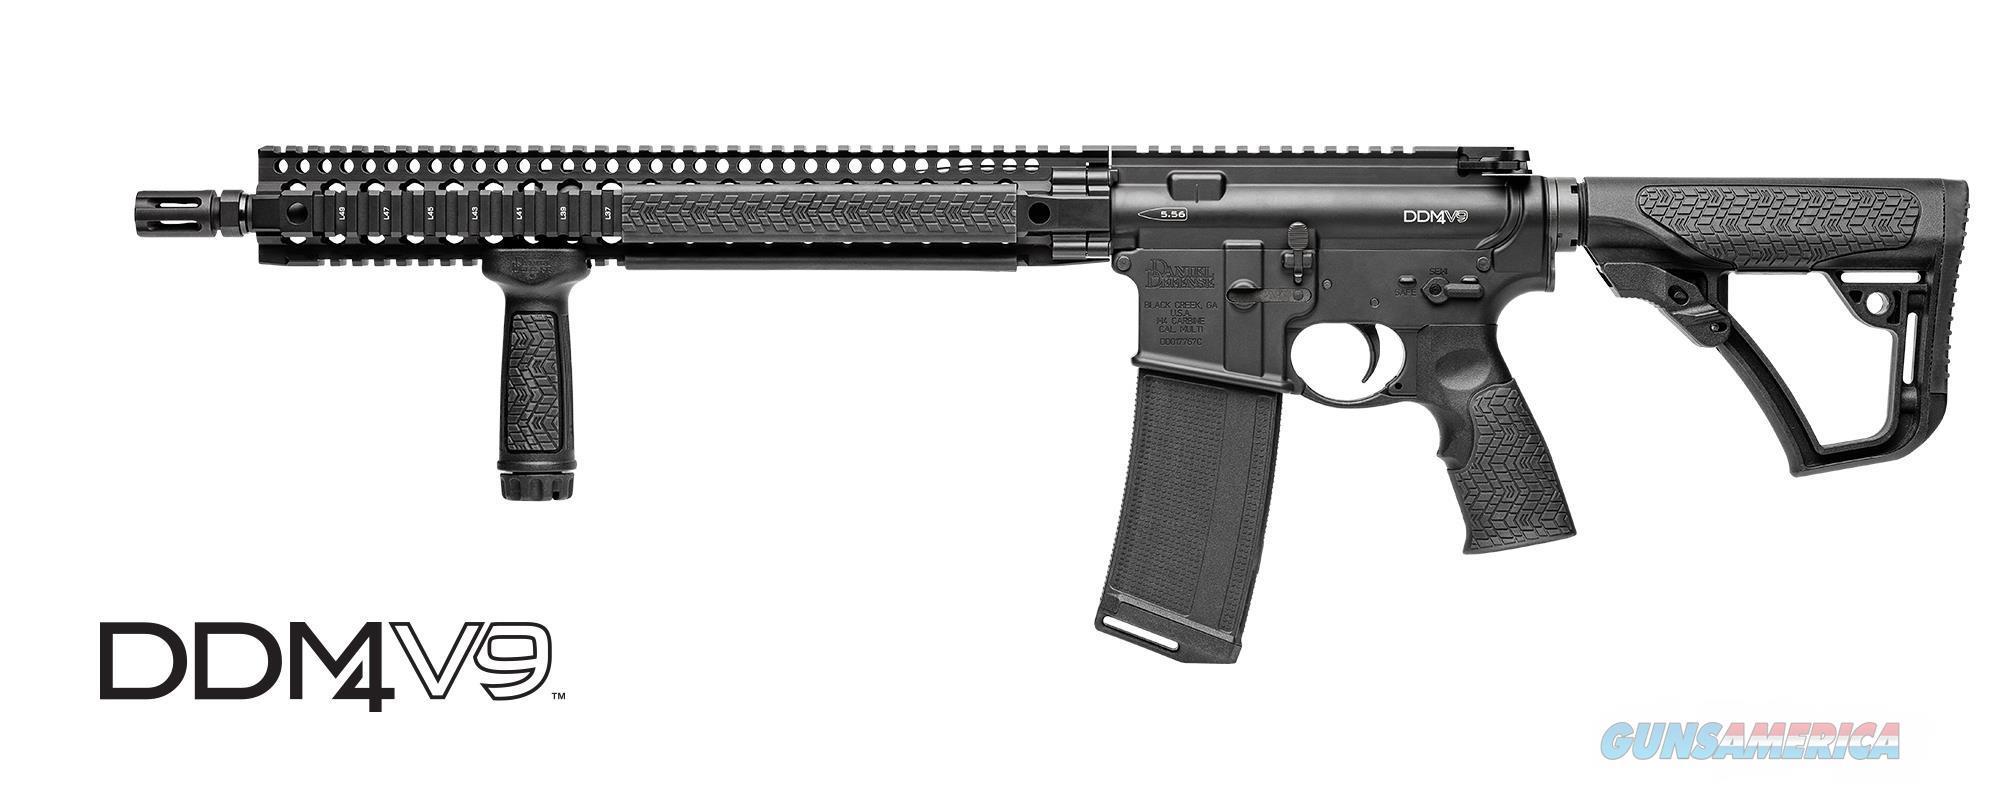 "Daniel Defense DDM4V9 LW 5.56mm 16"" 02-145-16030-047   Guns > Rifles > Daniel Defense > Complete Rifles"